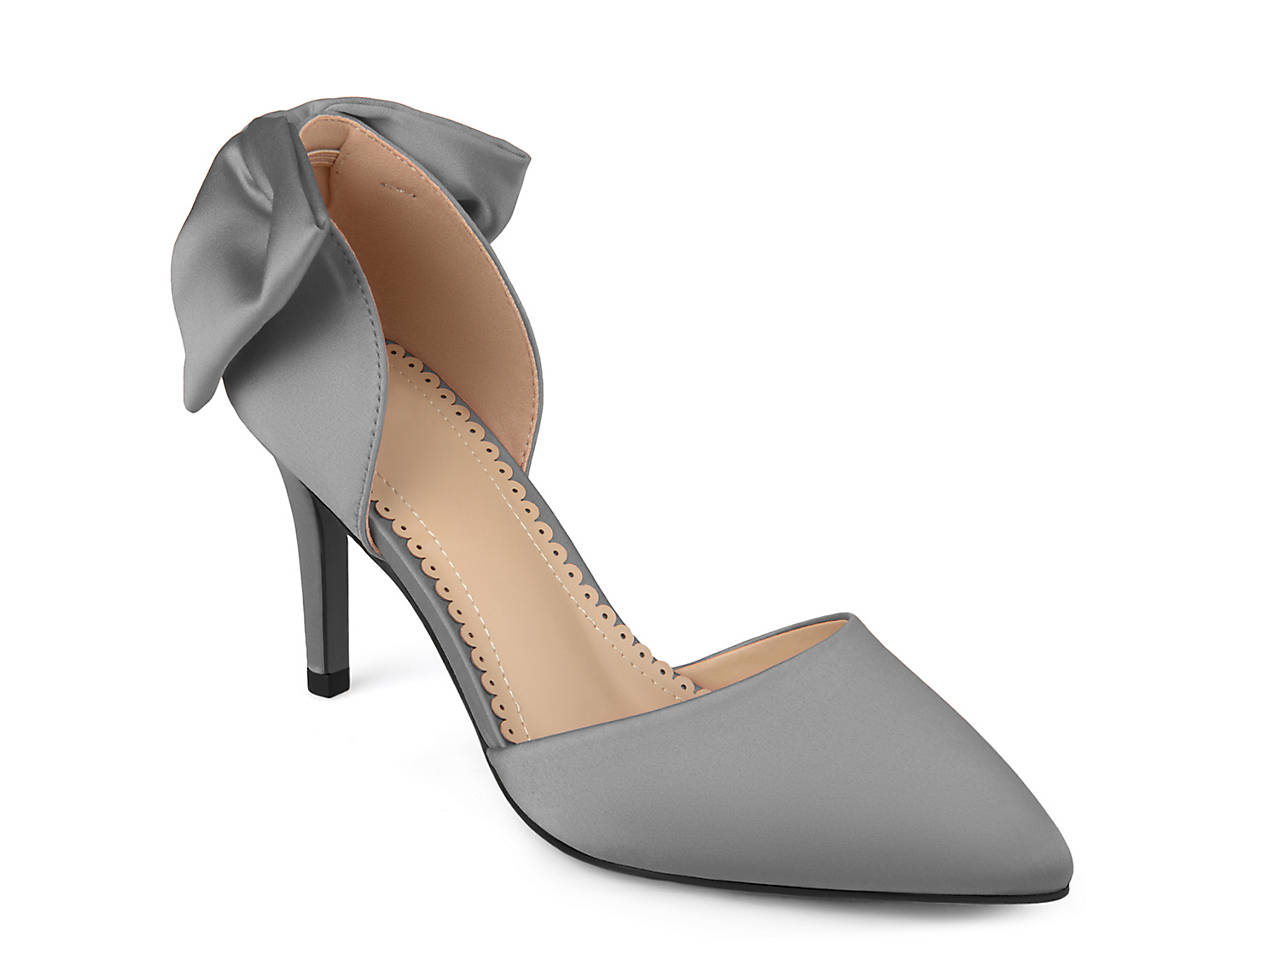 f2c495316255 Journee Collection Tanzi Pump Women s Shoes